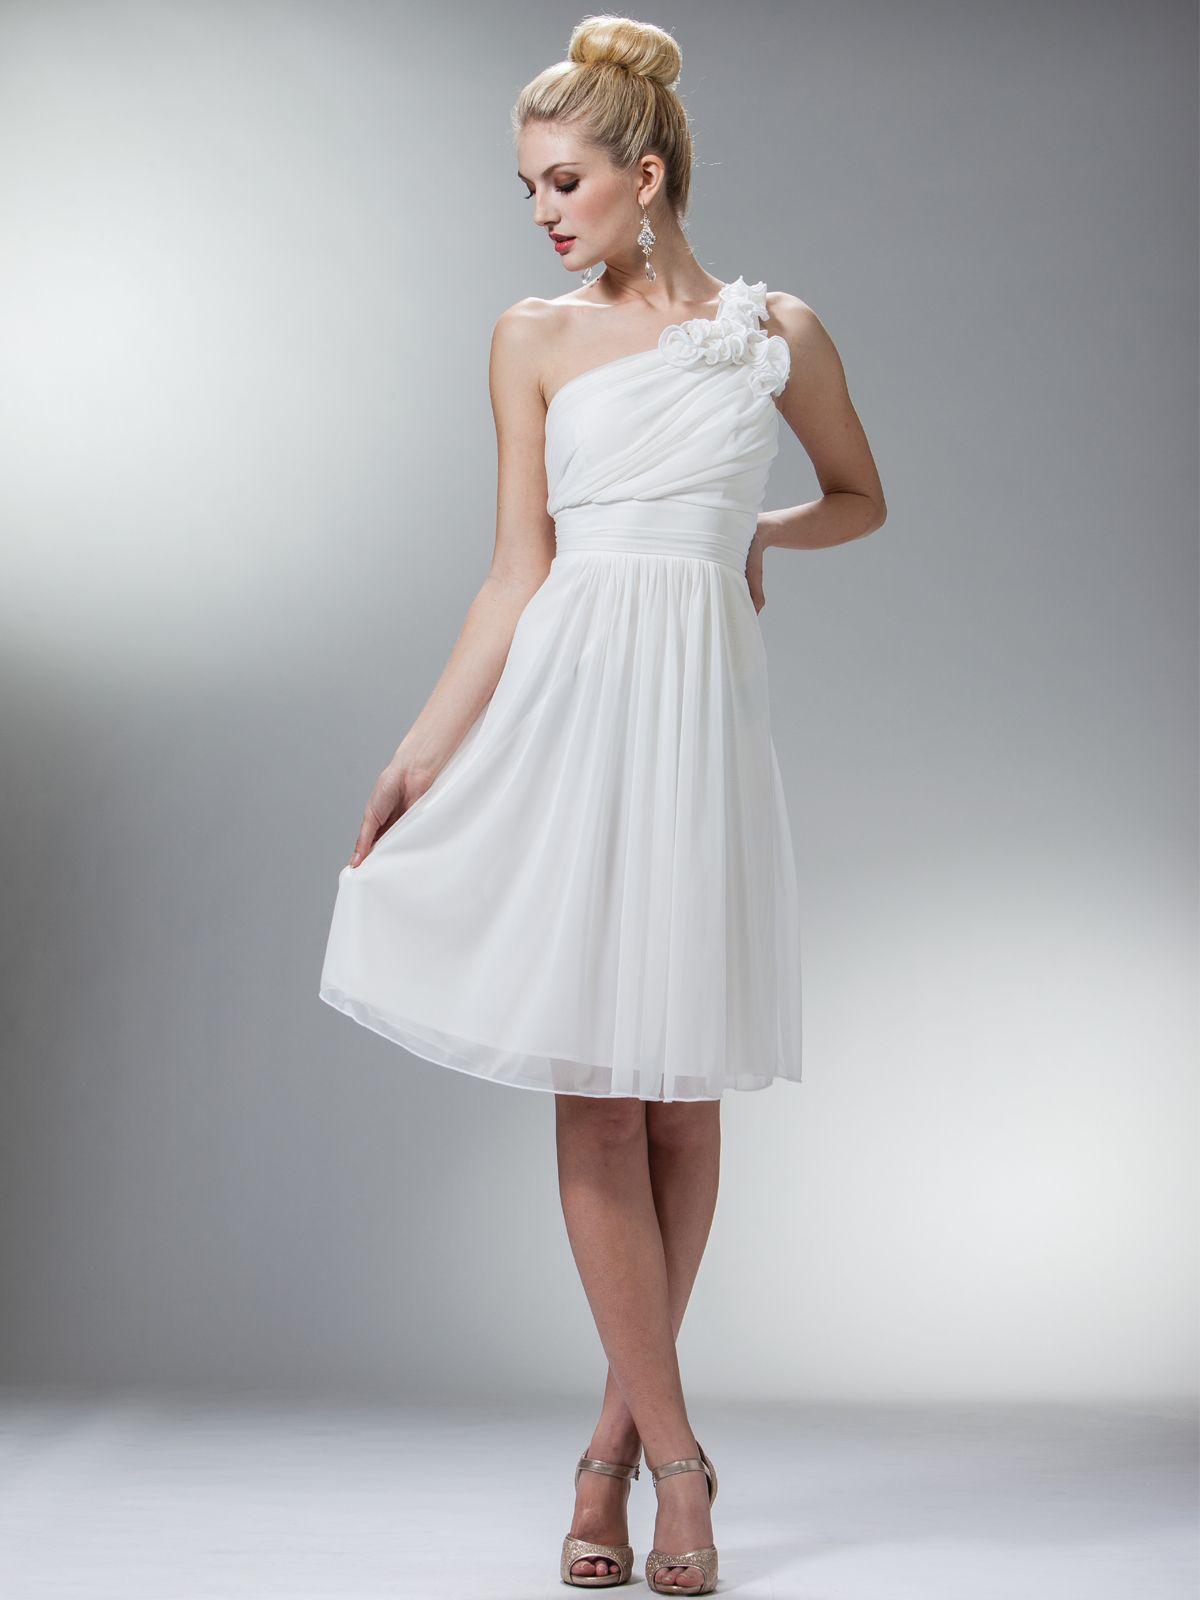 Off white one shoulder floral cocktail dress bridesmaid